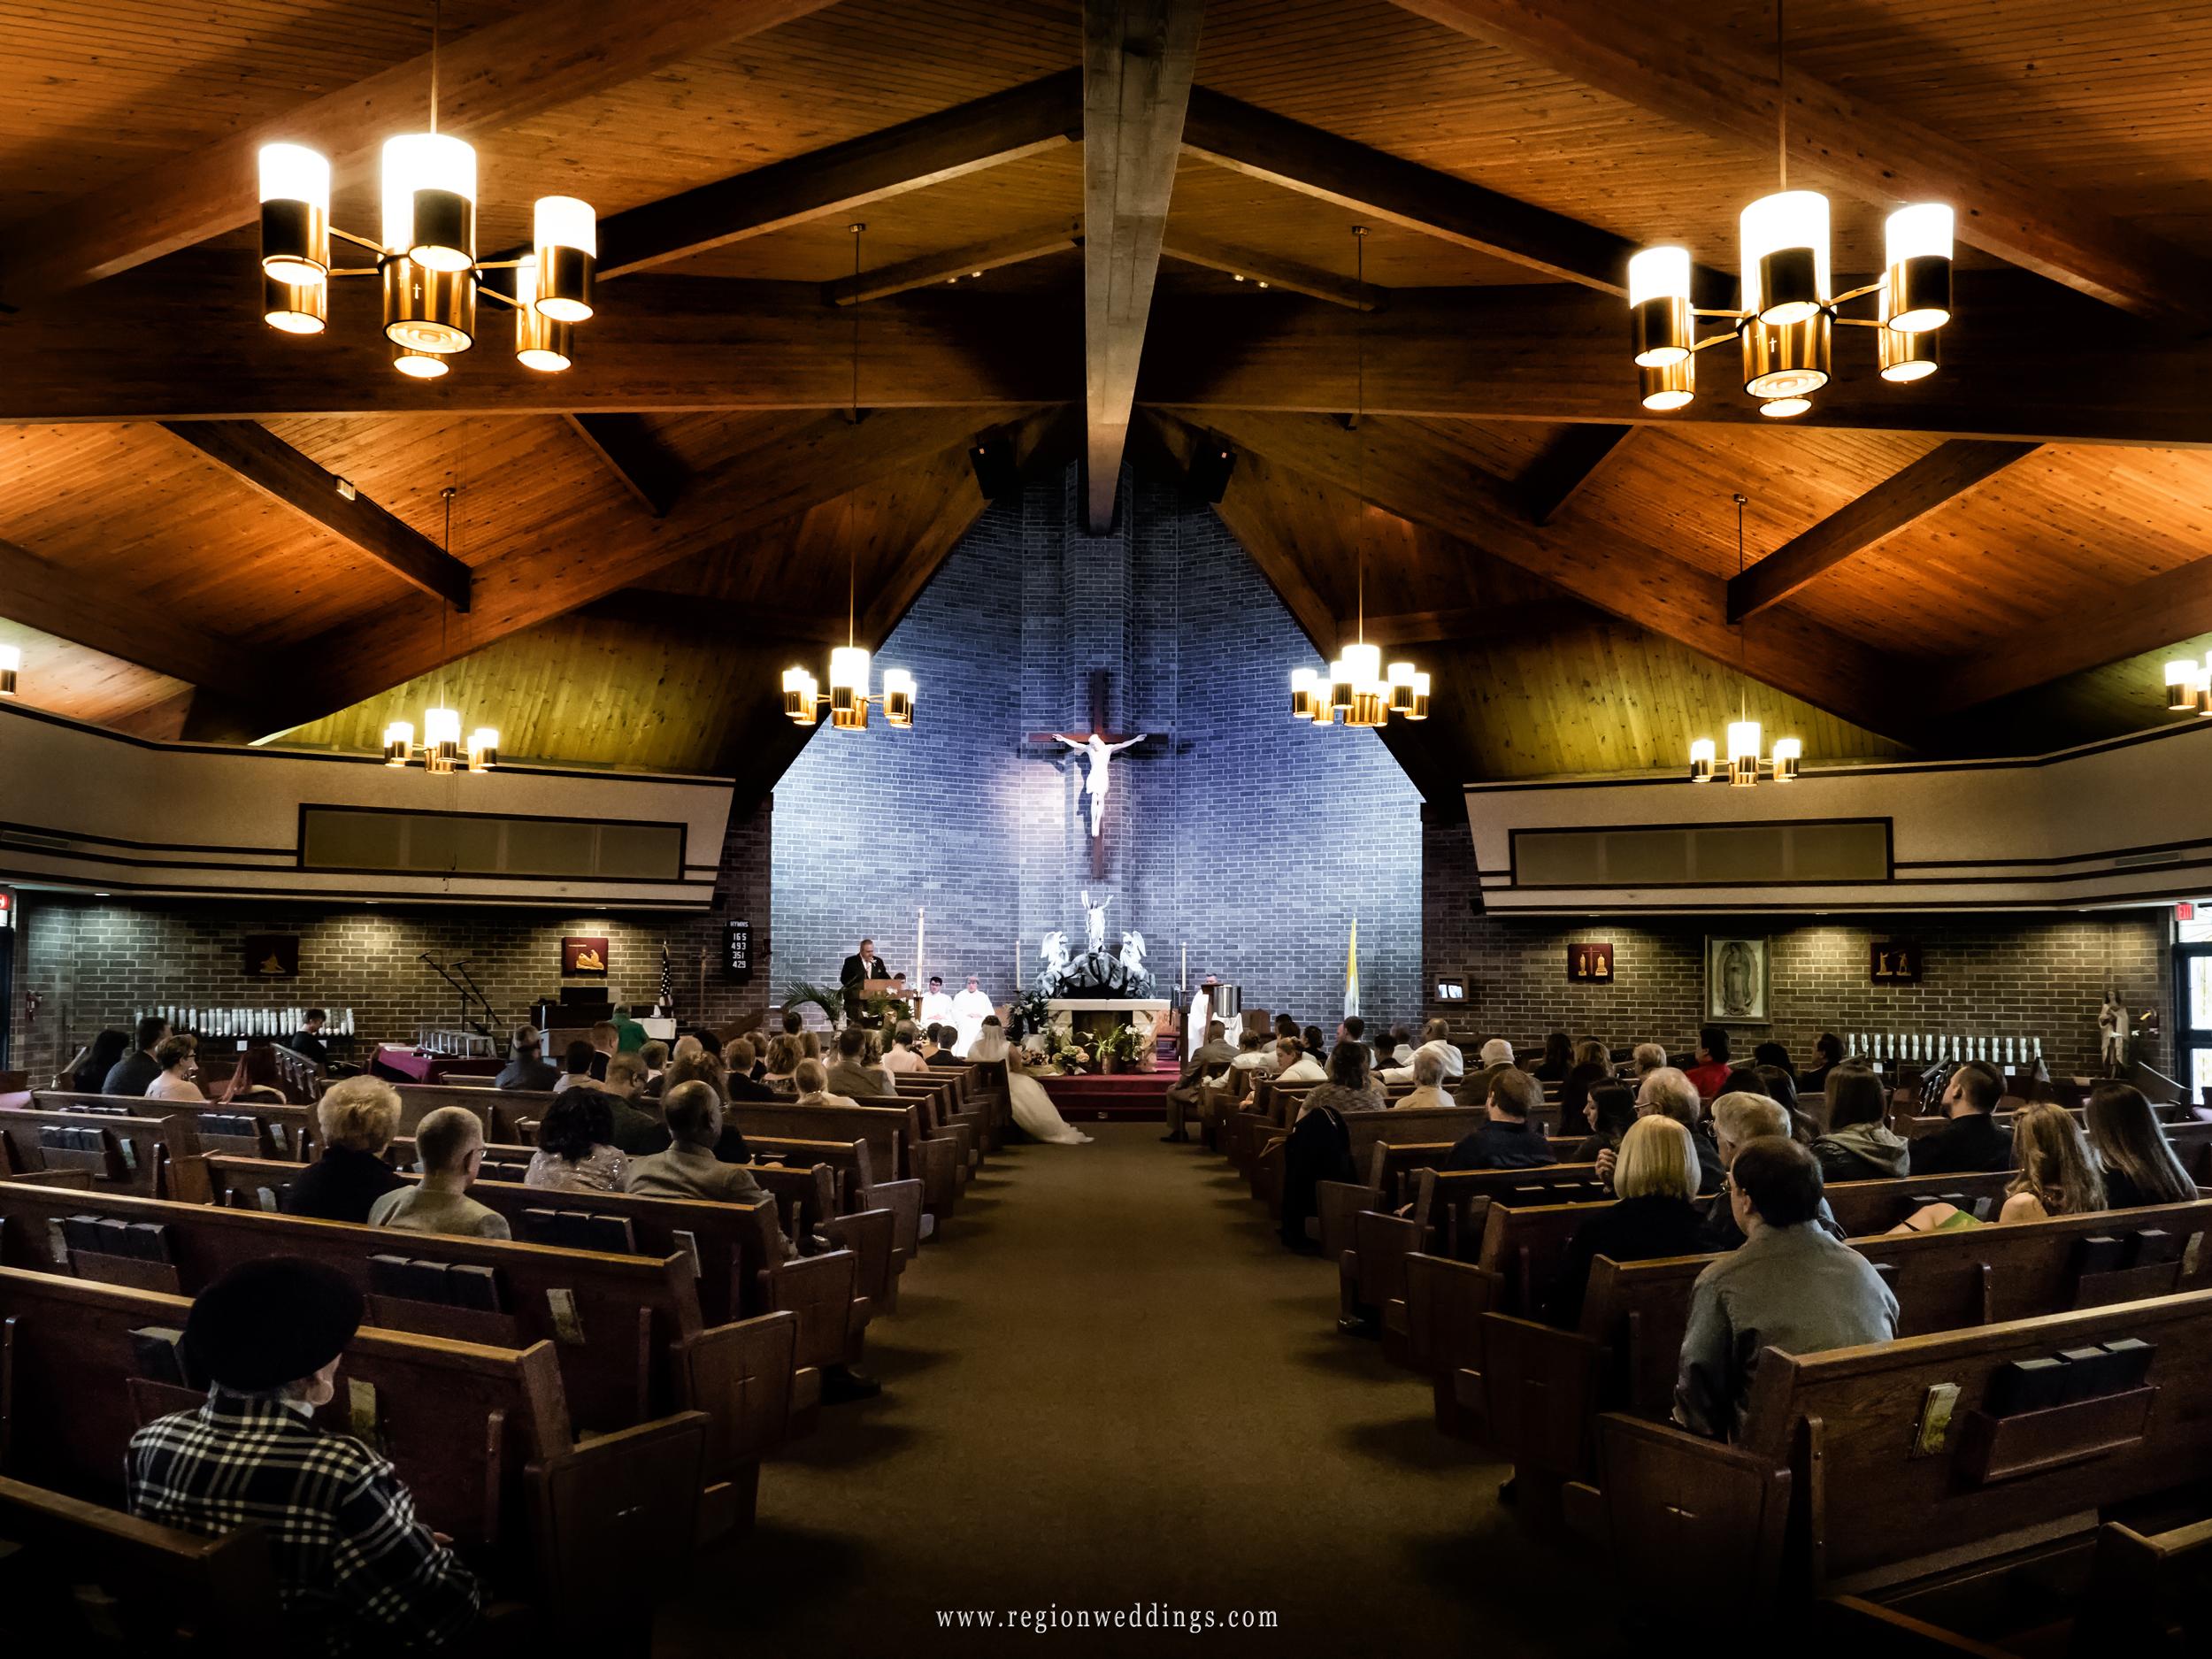 Wedding ceremony at St. James the Less Catholic Church